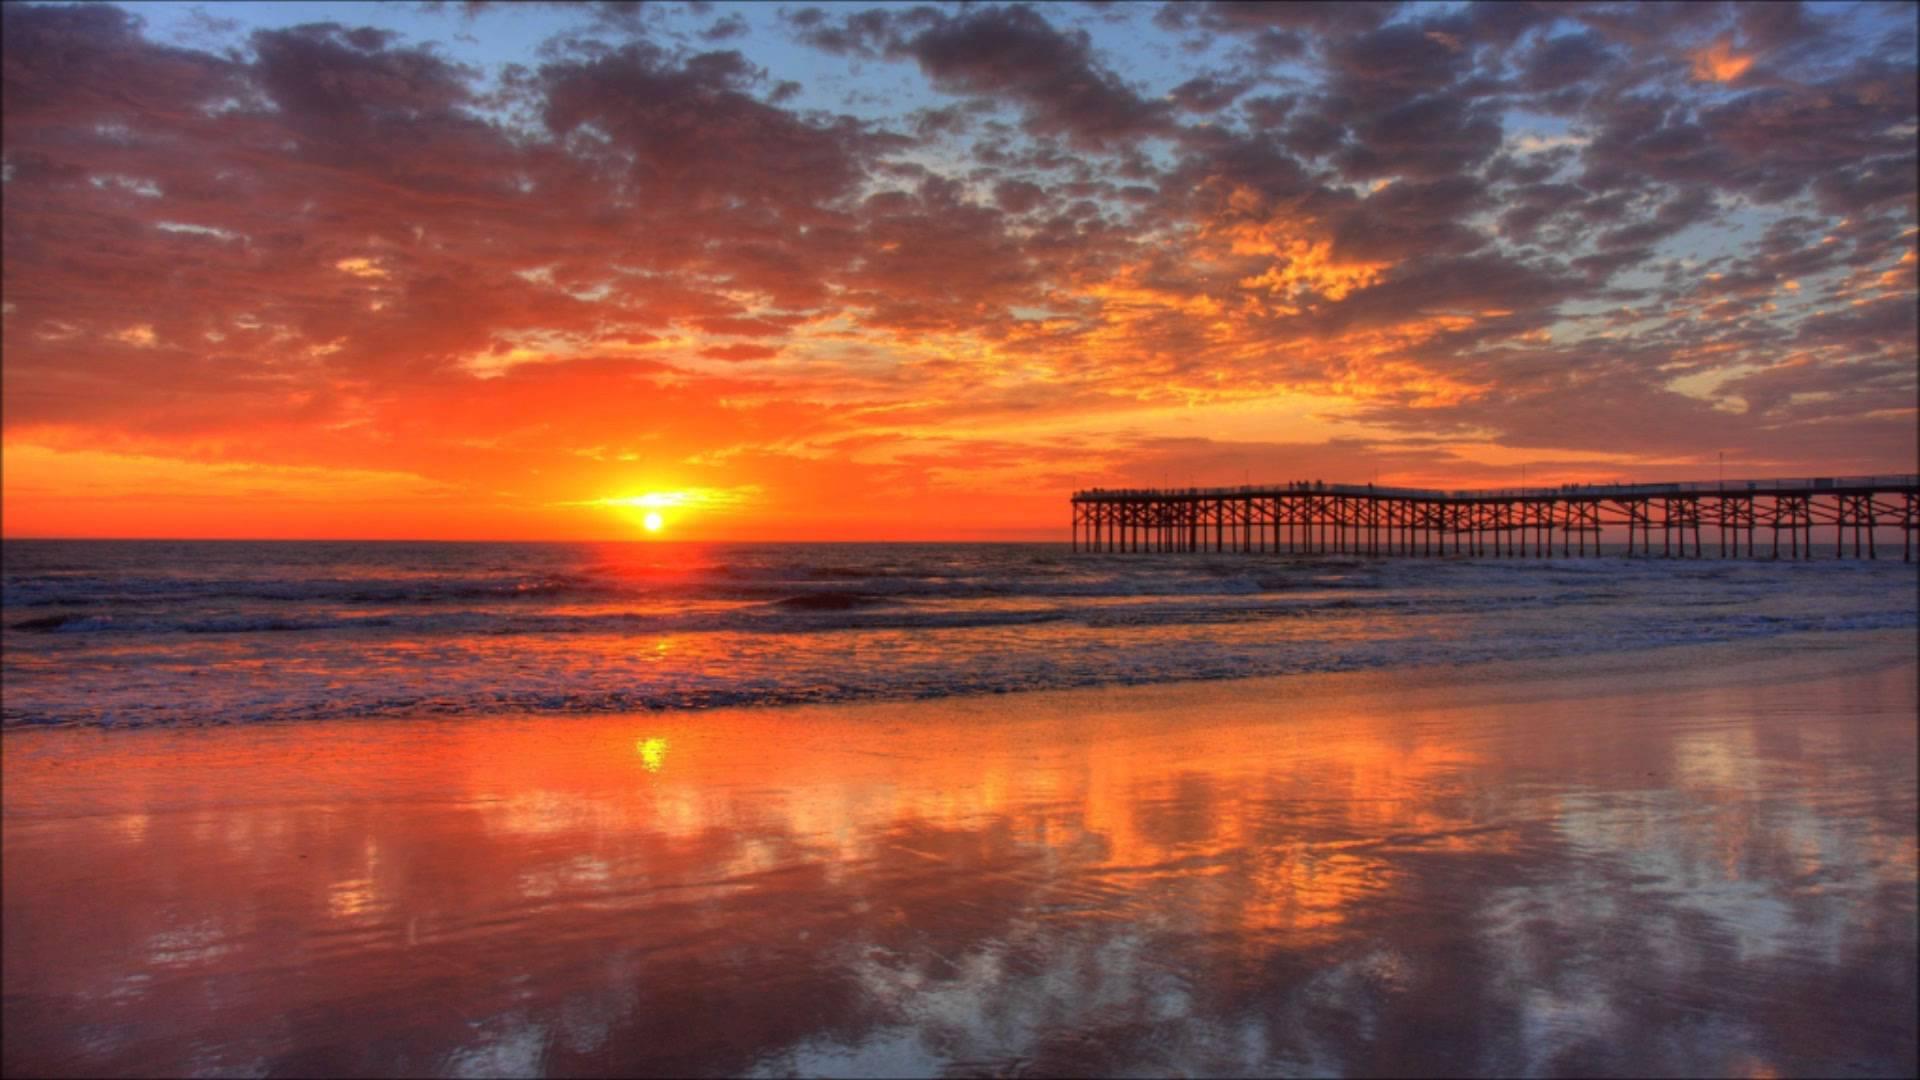 ATB - Sunset Beach feat. Anova (Original Mix) - YouTube